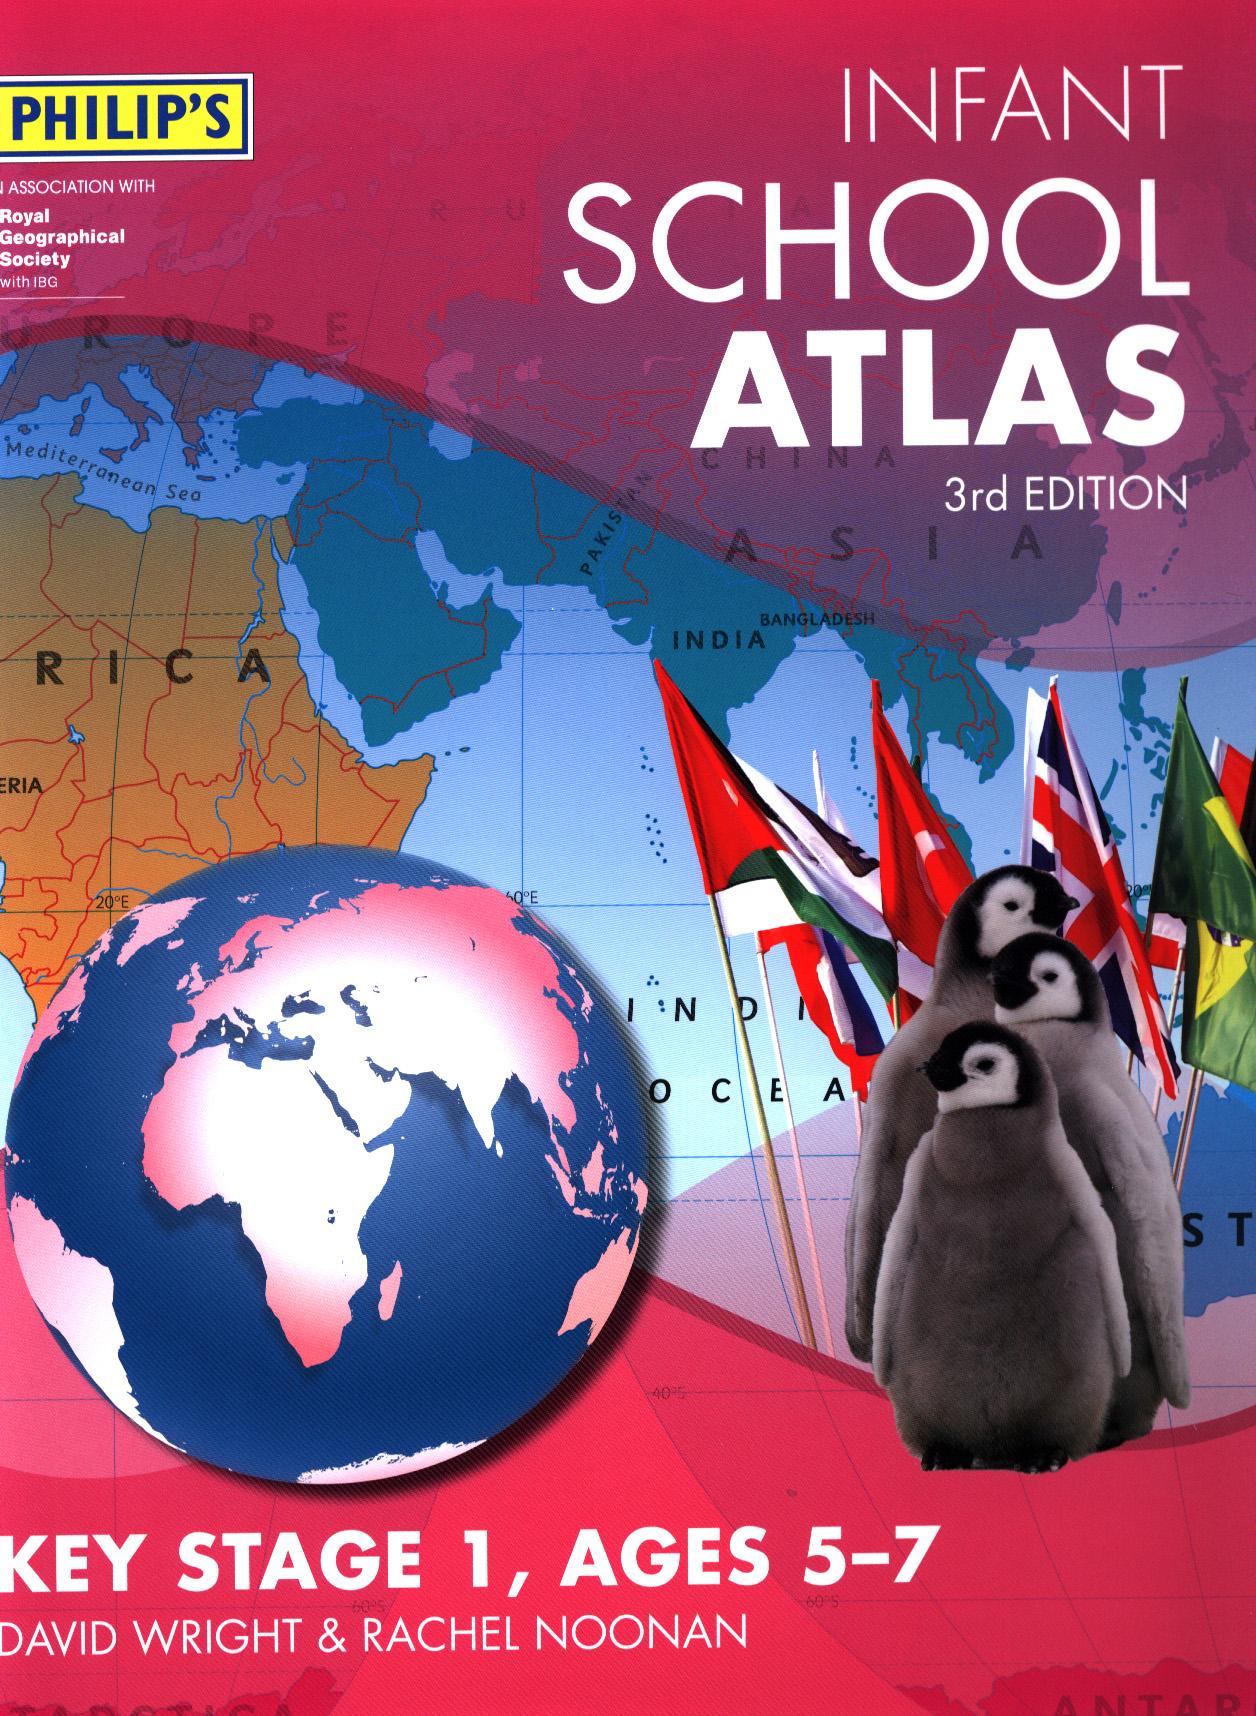 Map Of Uk Key Stage 1.Philip S Infant School Atlas By Noonan Rachel 9781849074896